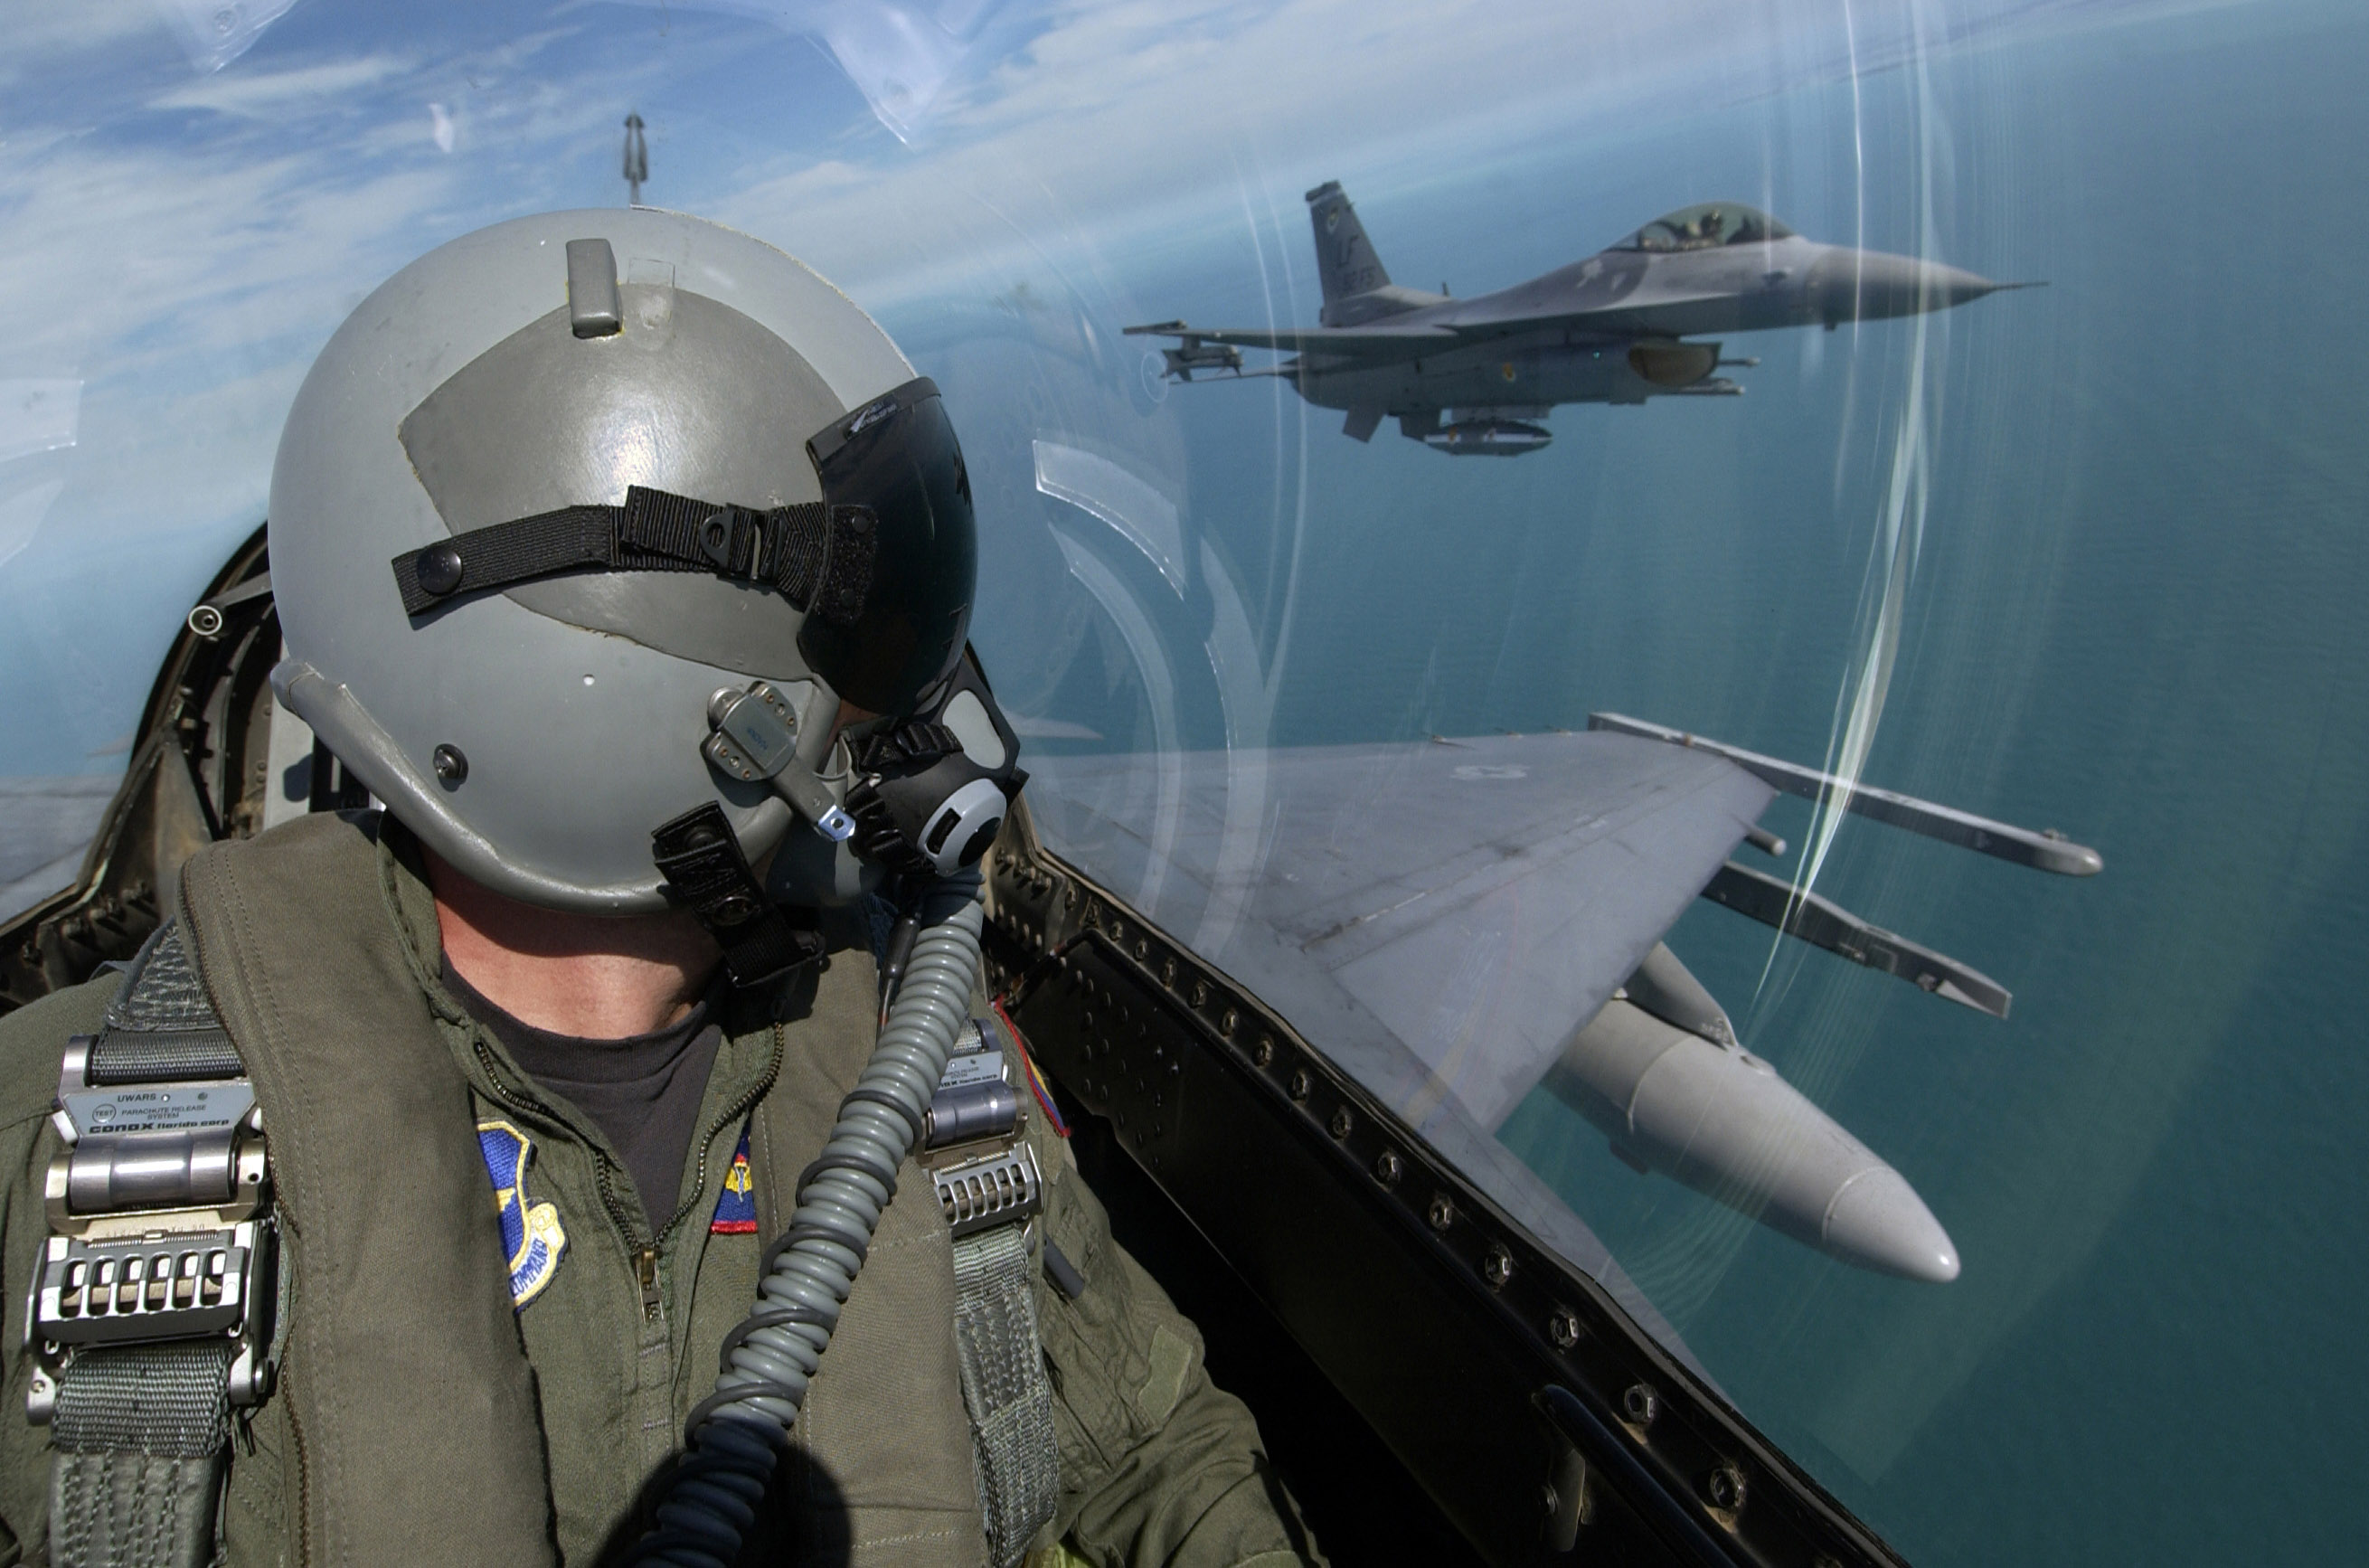 dissertation on aviation security